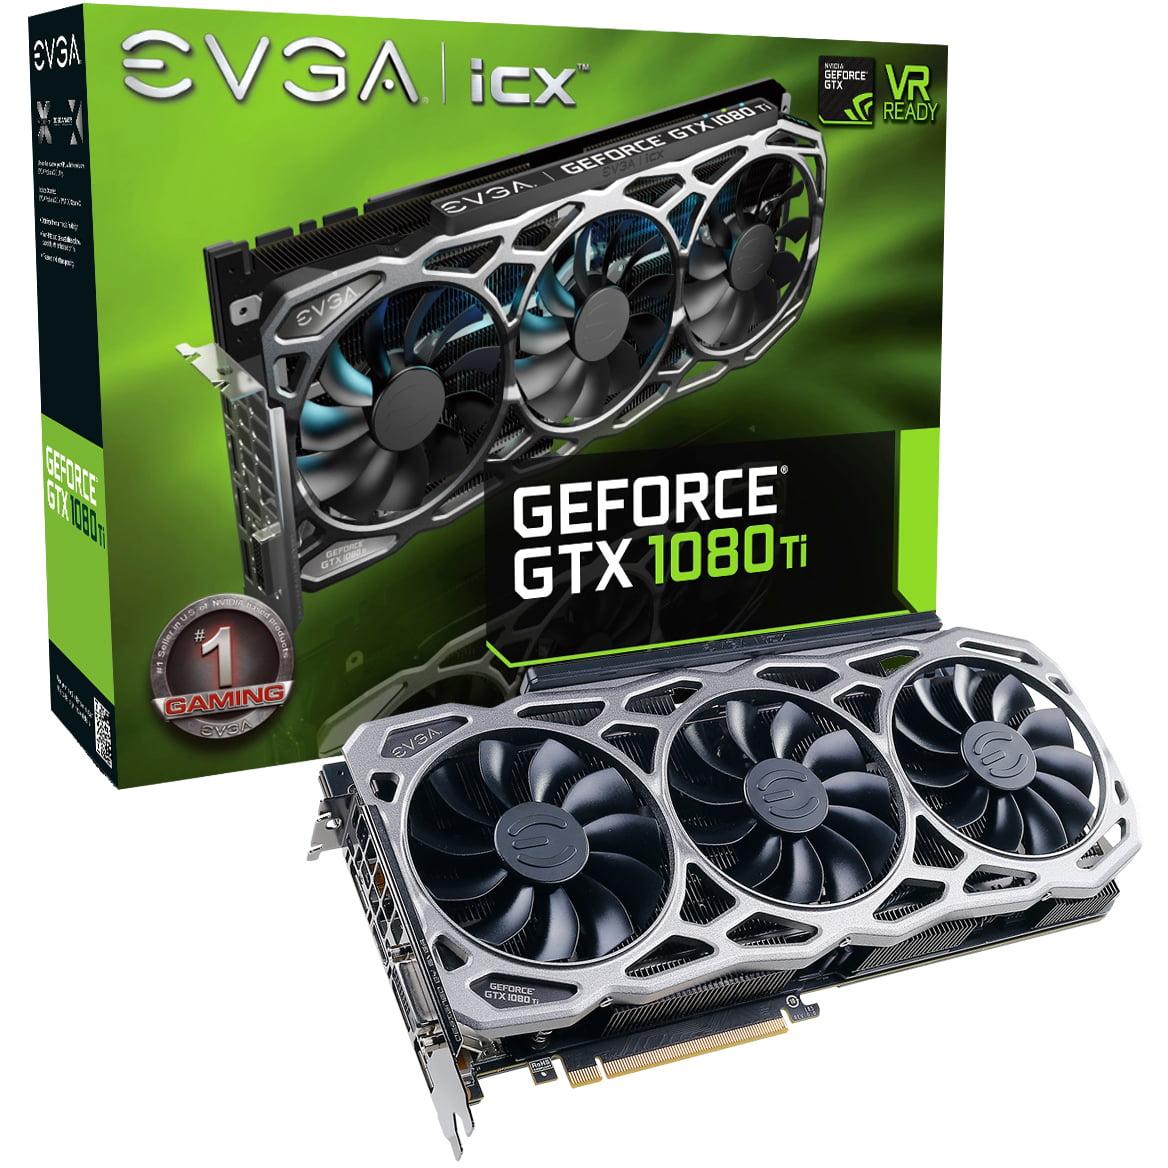 EVGA GeForce GTX 1080 Ti FTW3 GAMING, 11GB GDDR5X, iCX Technology 9 Thermal Sensors & RGB LED G P M, 3x Async... by EVGA